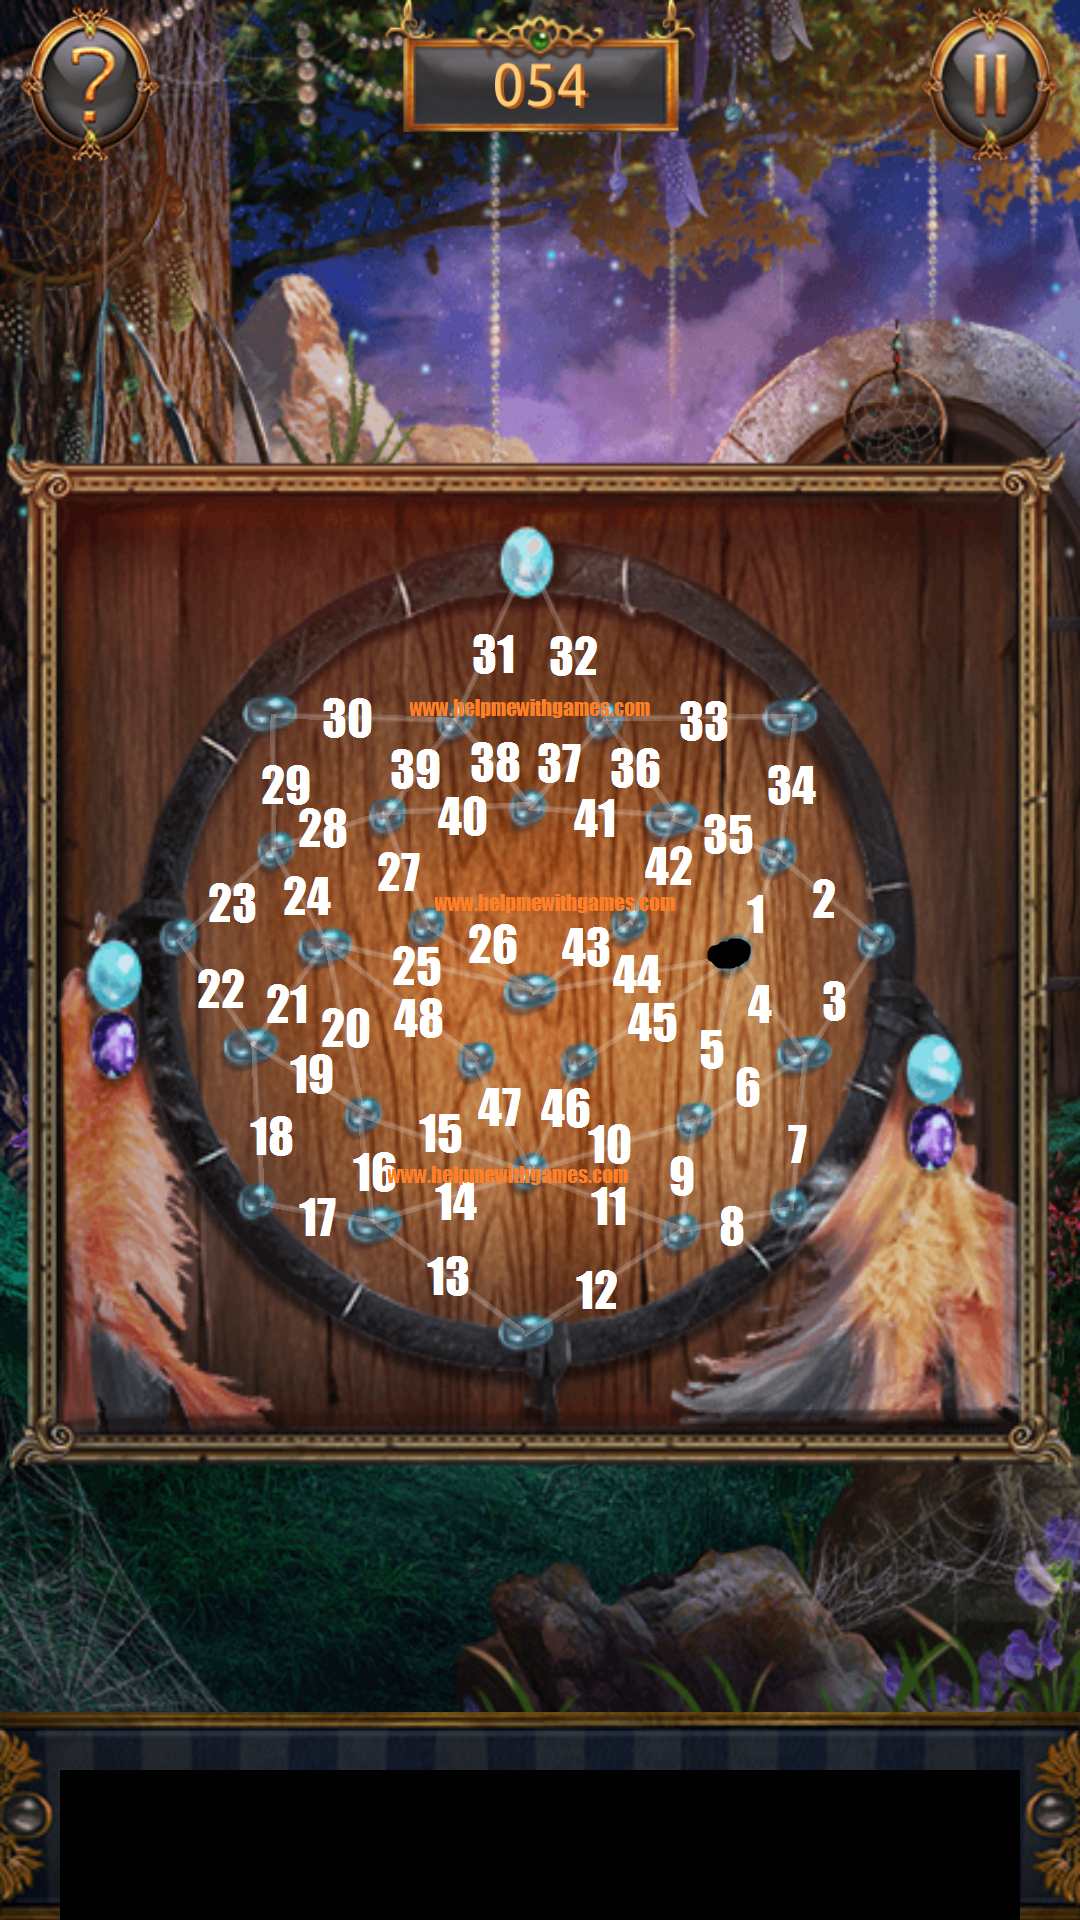 100 Doors Incredible 2 Walkthrough Level 54 Helpmewithgames